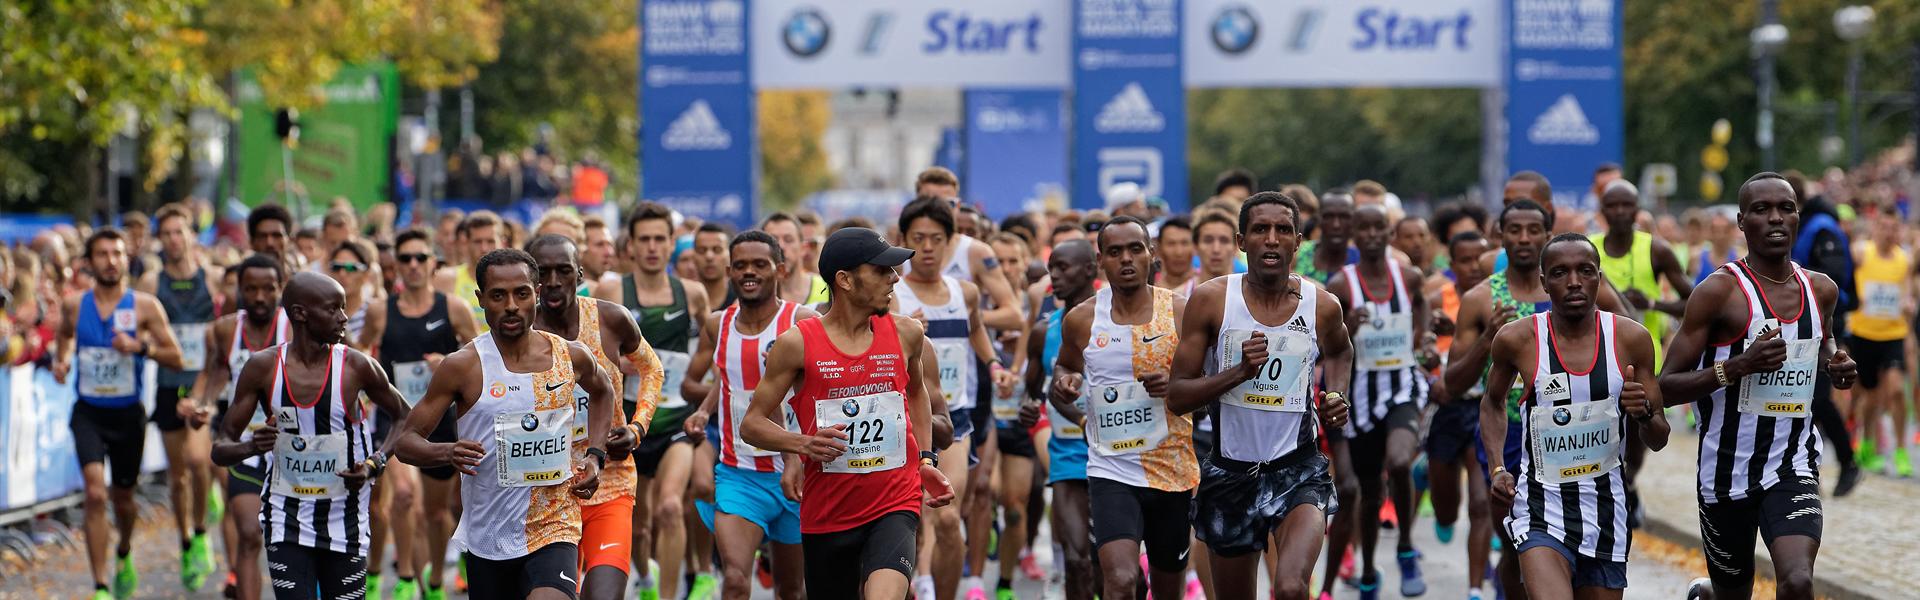 Acea Run Rome The Marathon rafforza la partnership con BMW Berlin Marathon